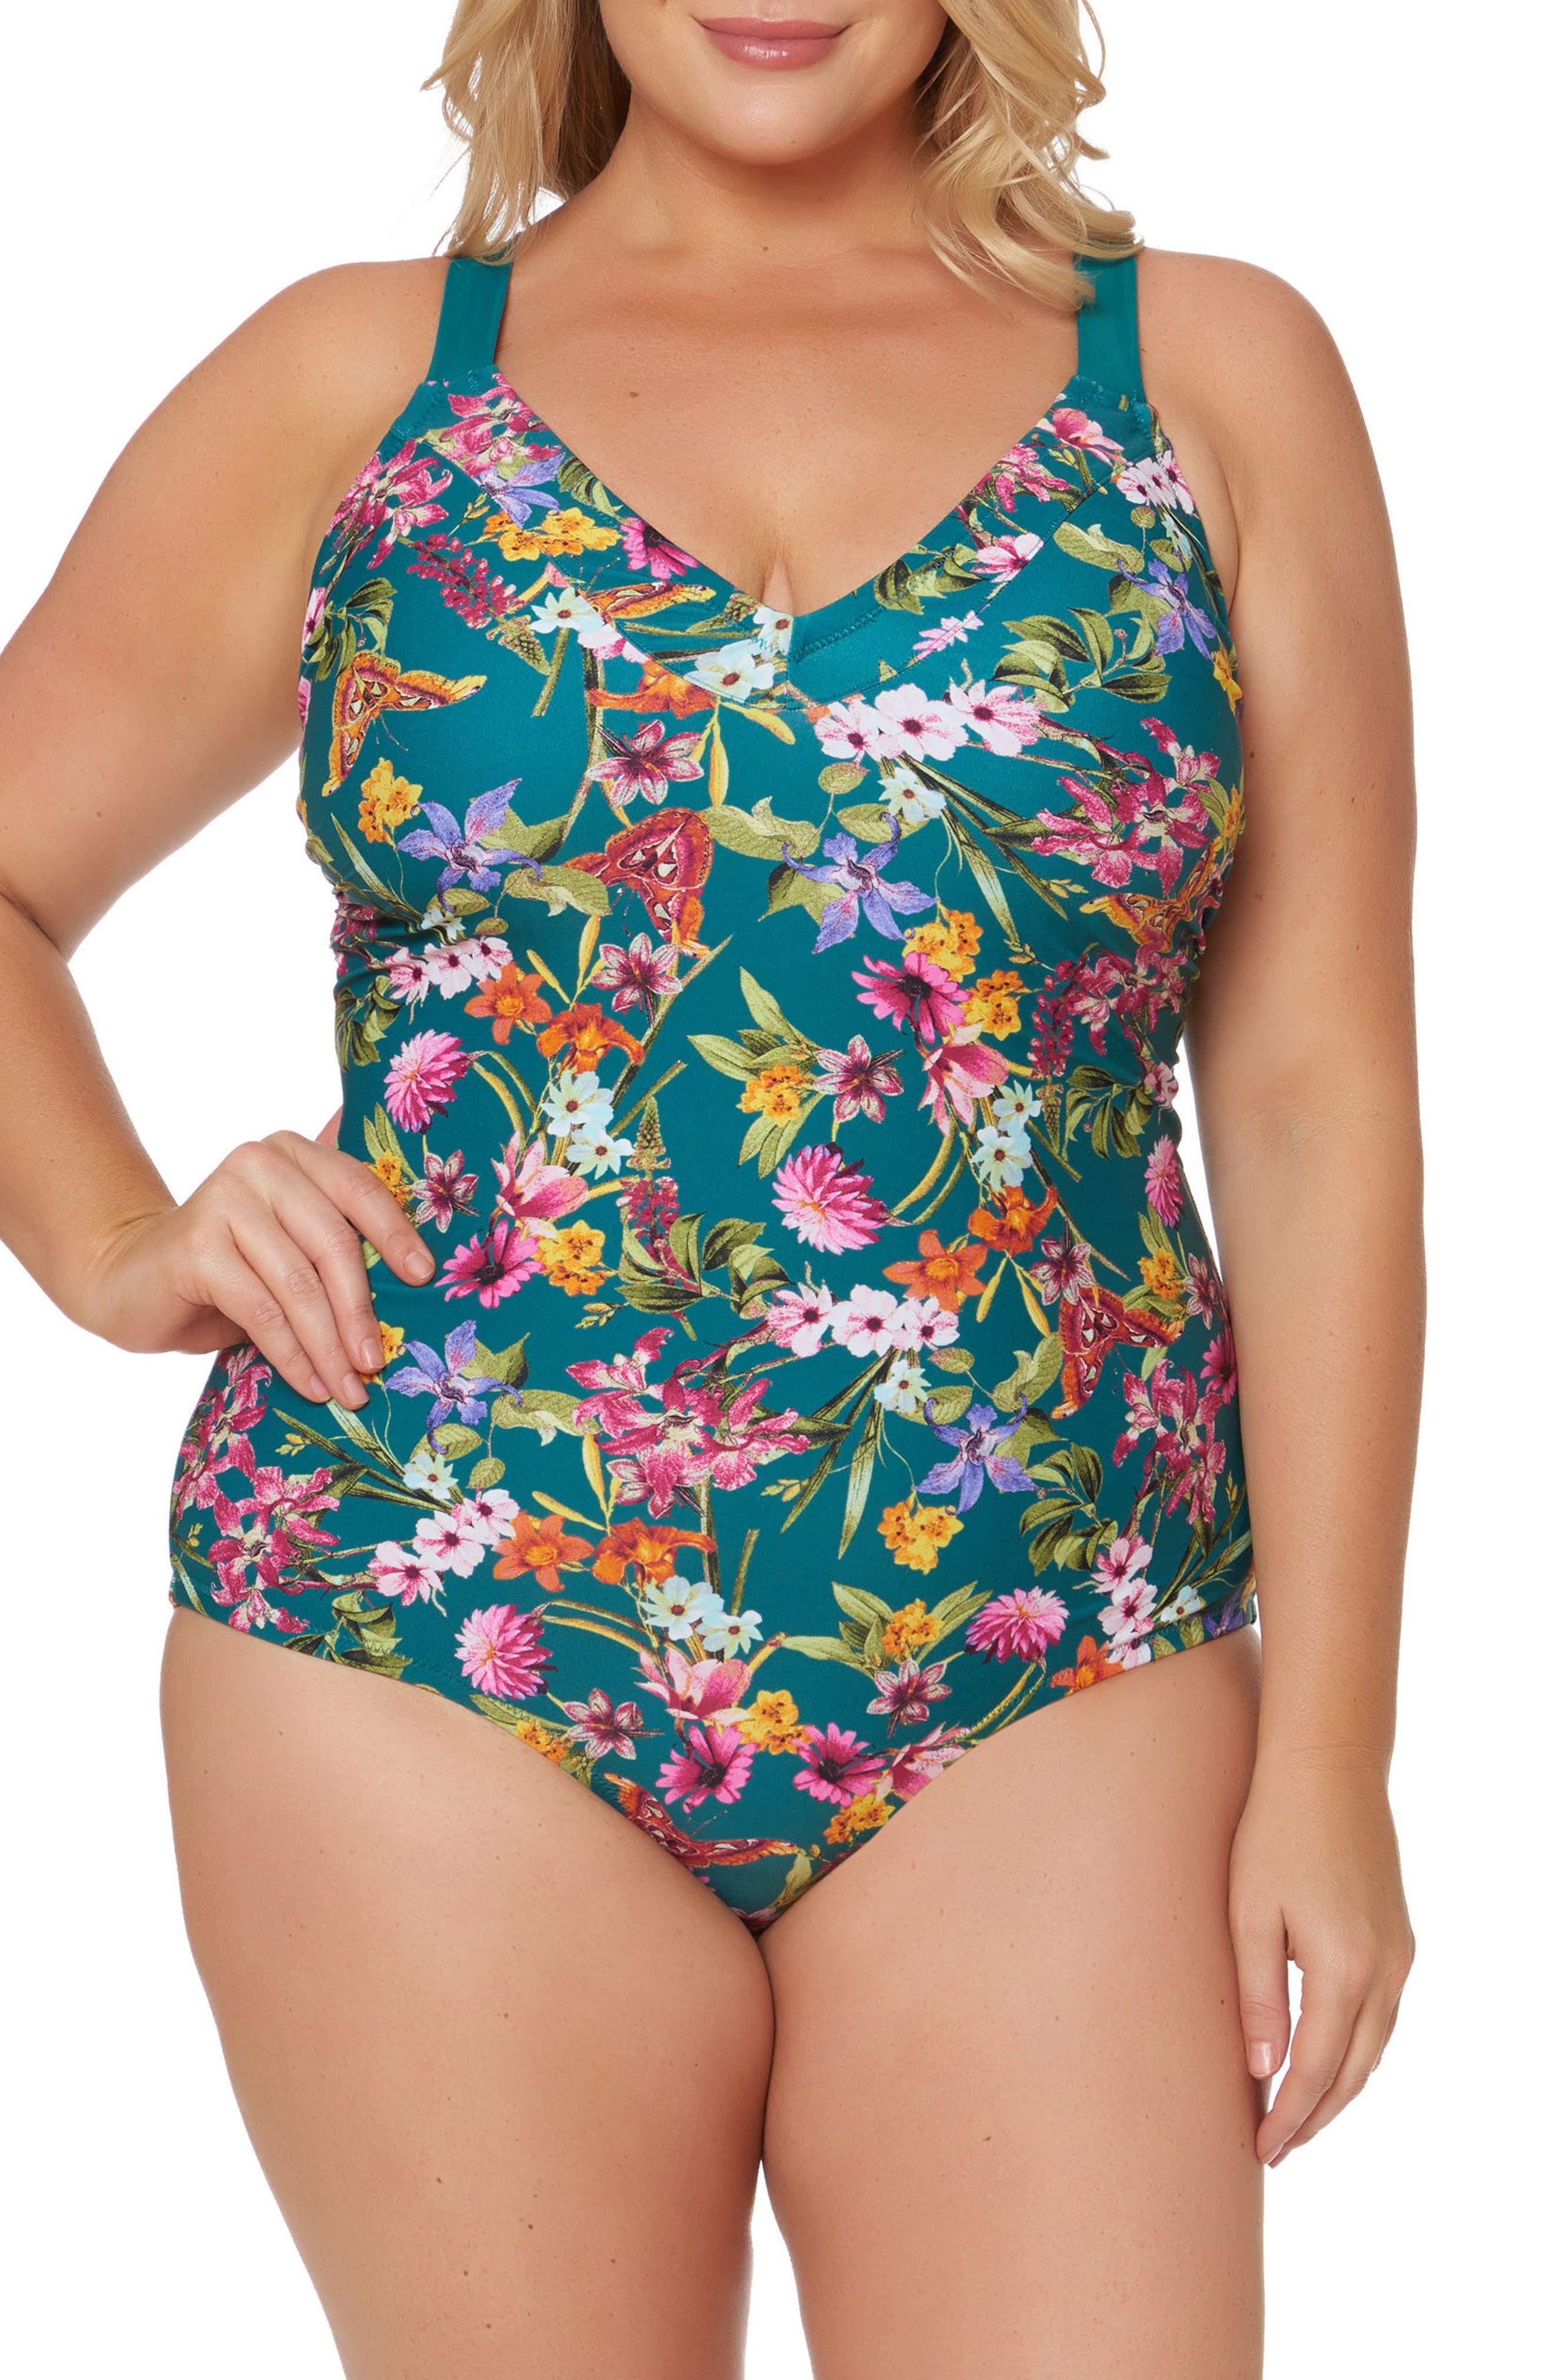 Main Image - Jessica Simpson Floral Print Tie Back One-Piece Swimsuit (Plus Size)